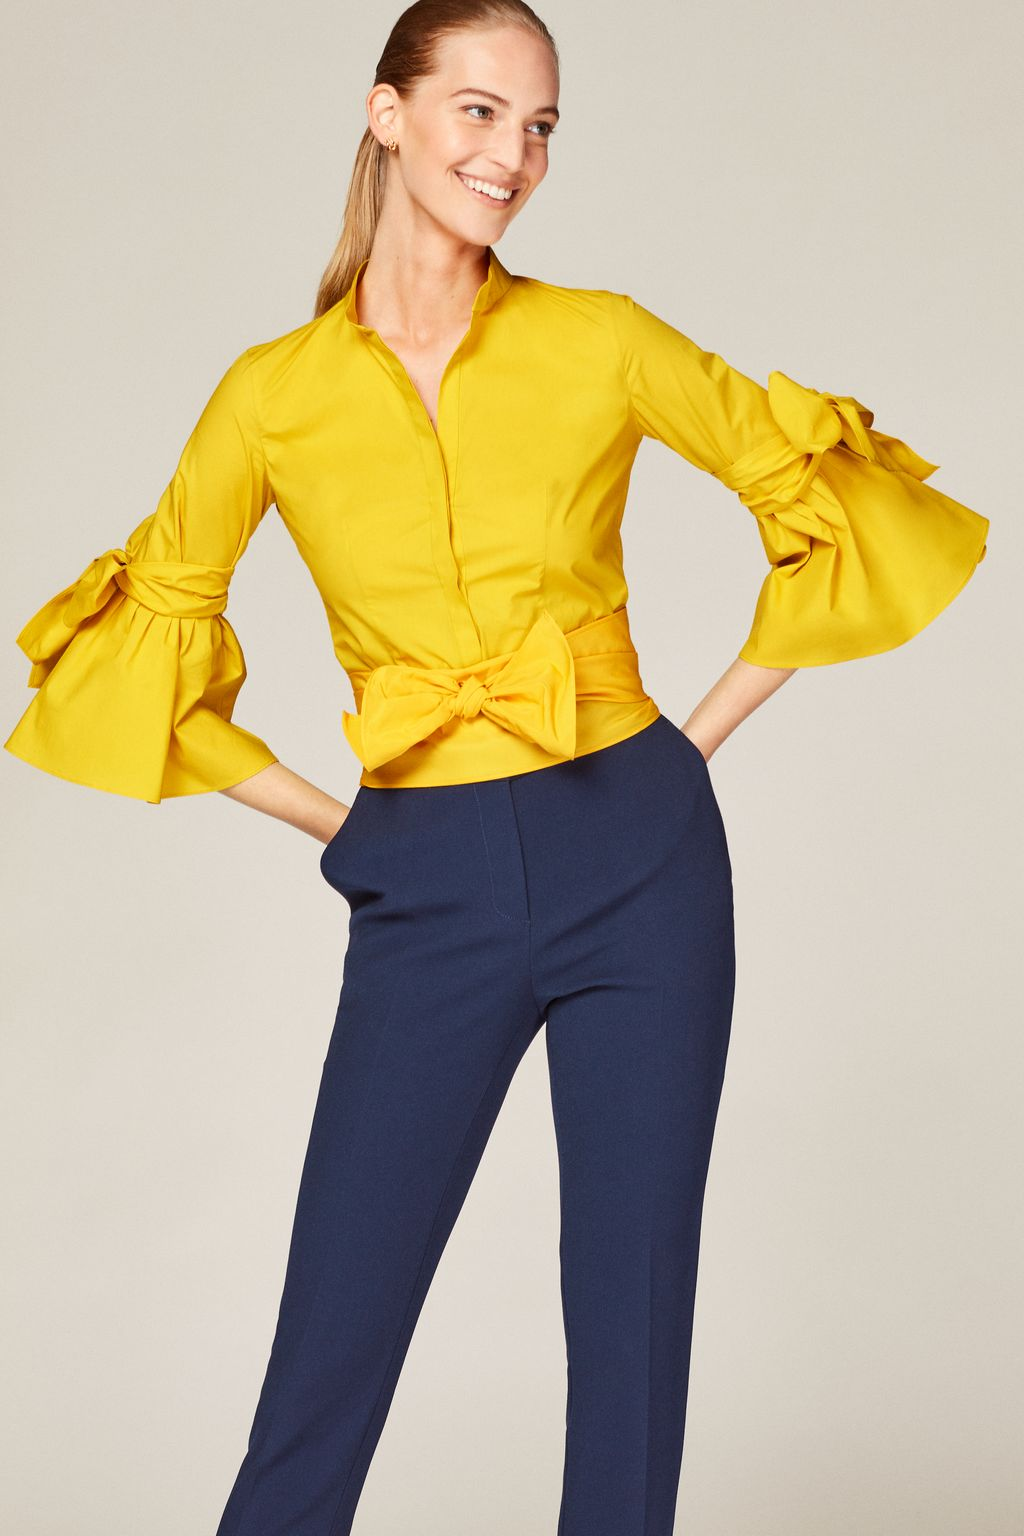 Taffeta shirt with flared sleeves